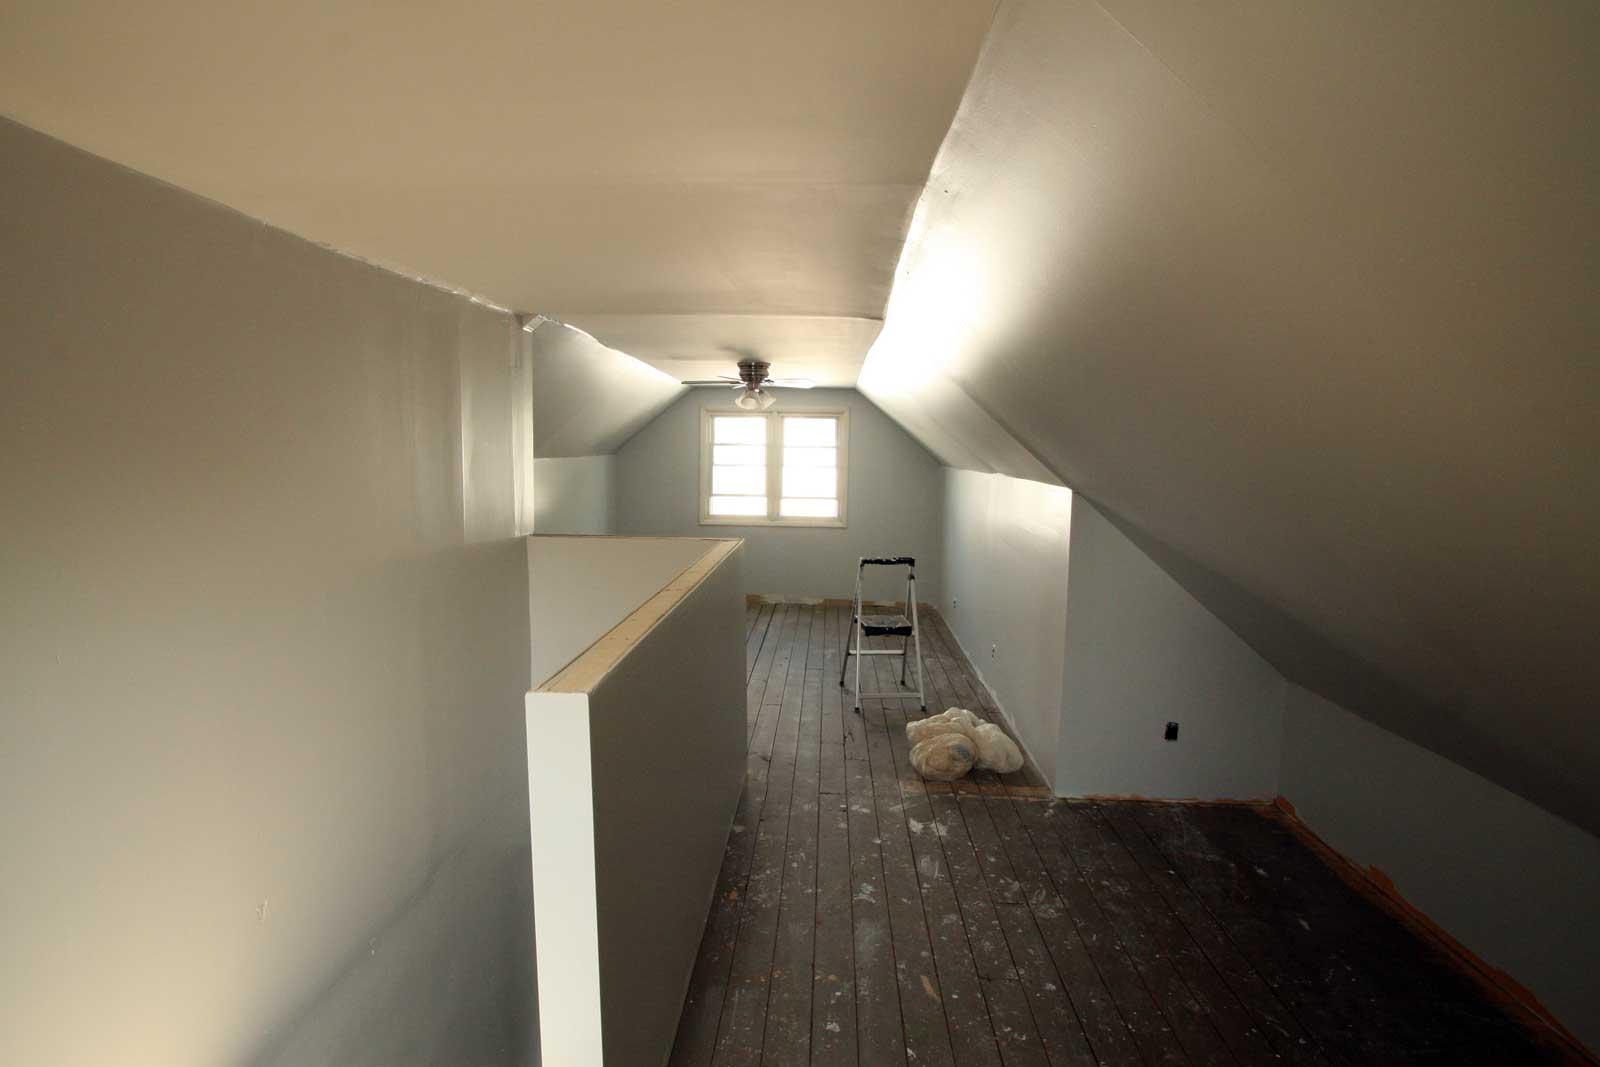 Painting attic walls